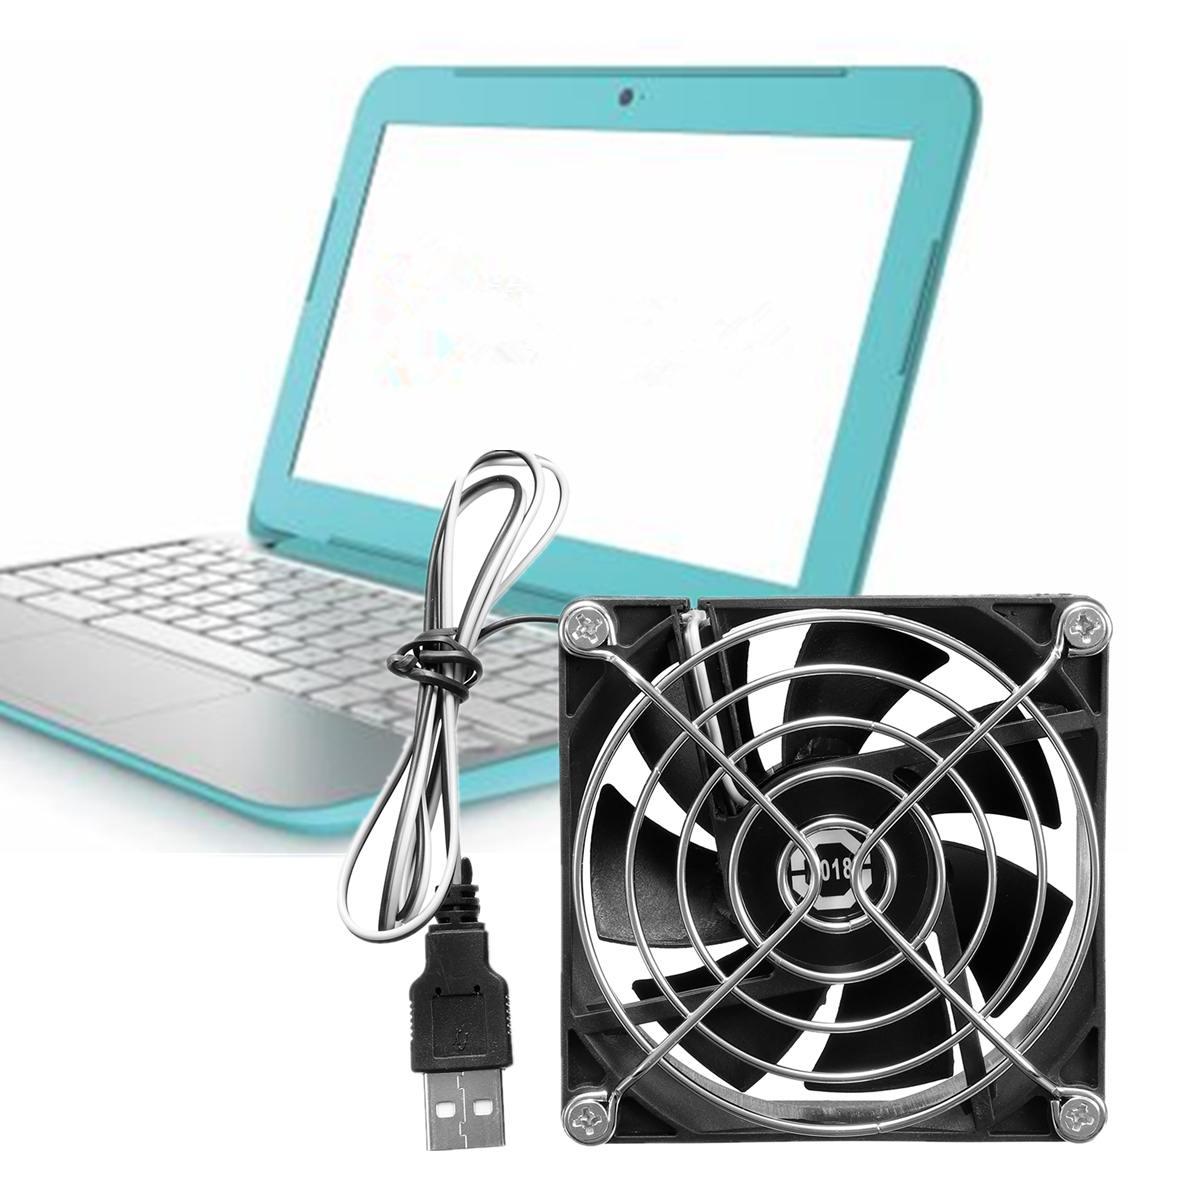 Computer Fan Tragbare Usb Kühler Kleine Pc Cpu Kühlung Computer